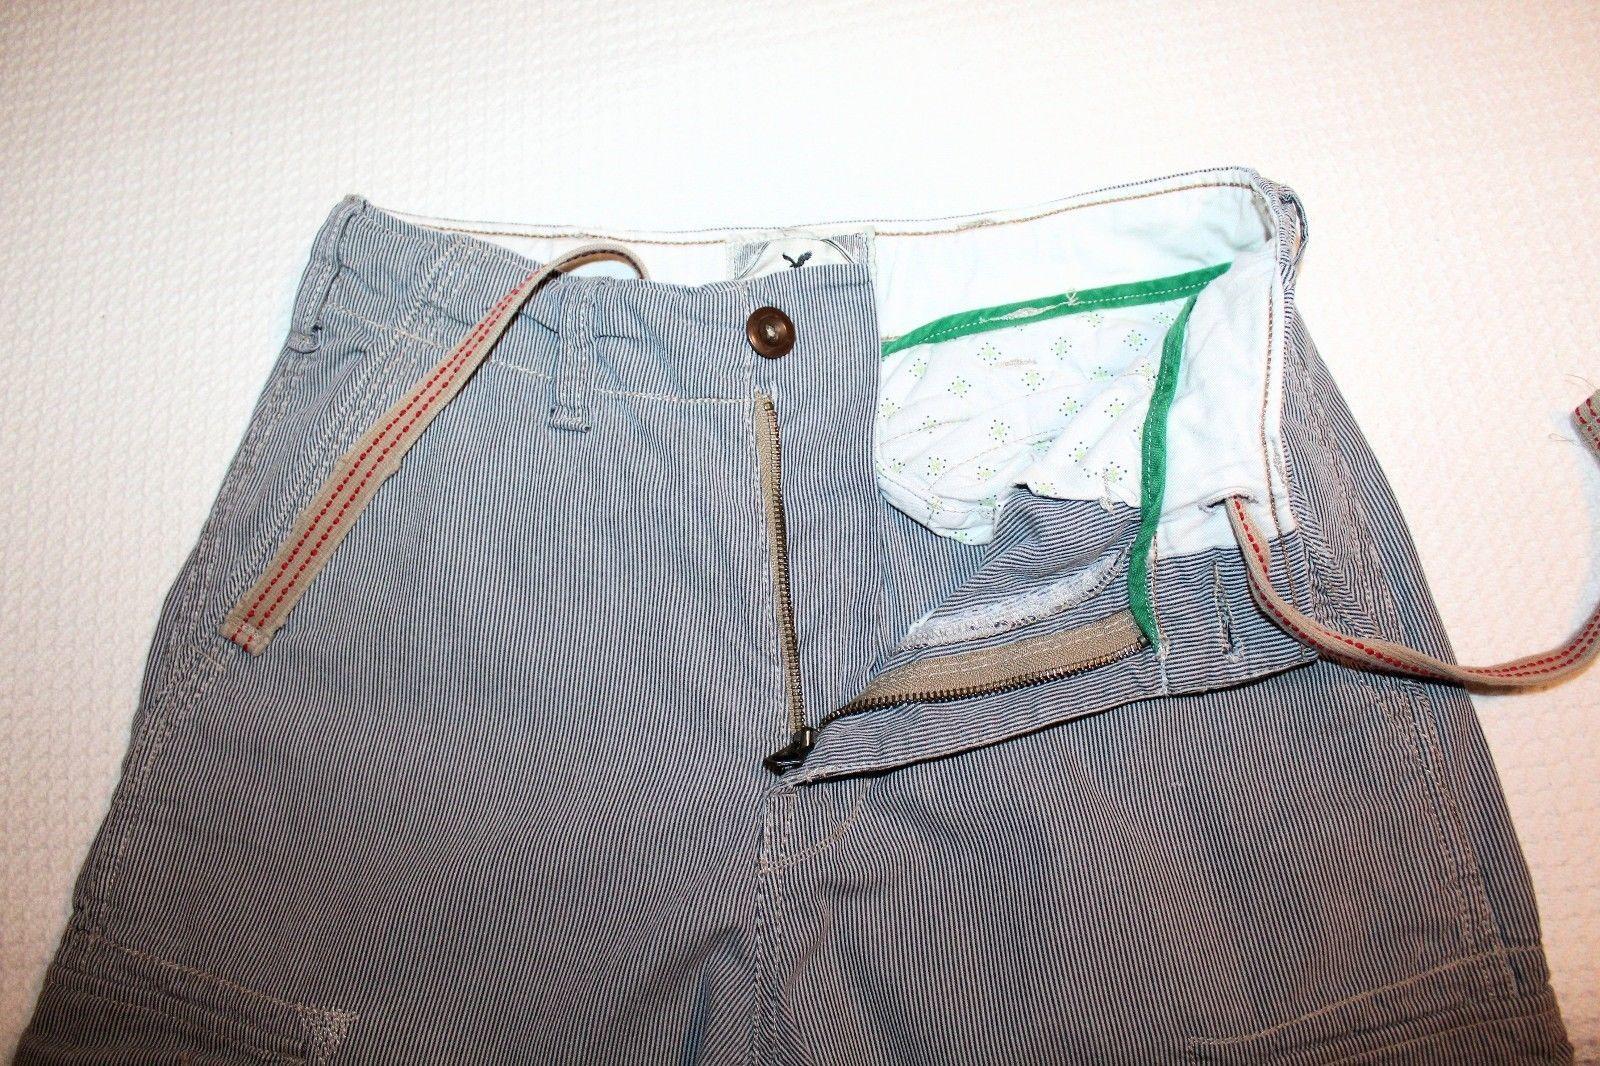 Vintage AMERICAN EAGLE Men's Size 28 Seersucker Cargo Longer Length Shorts